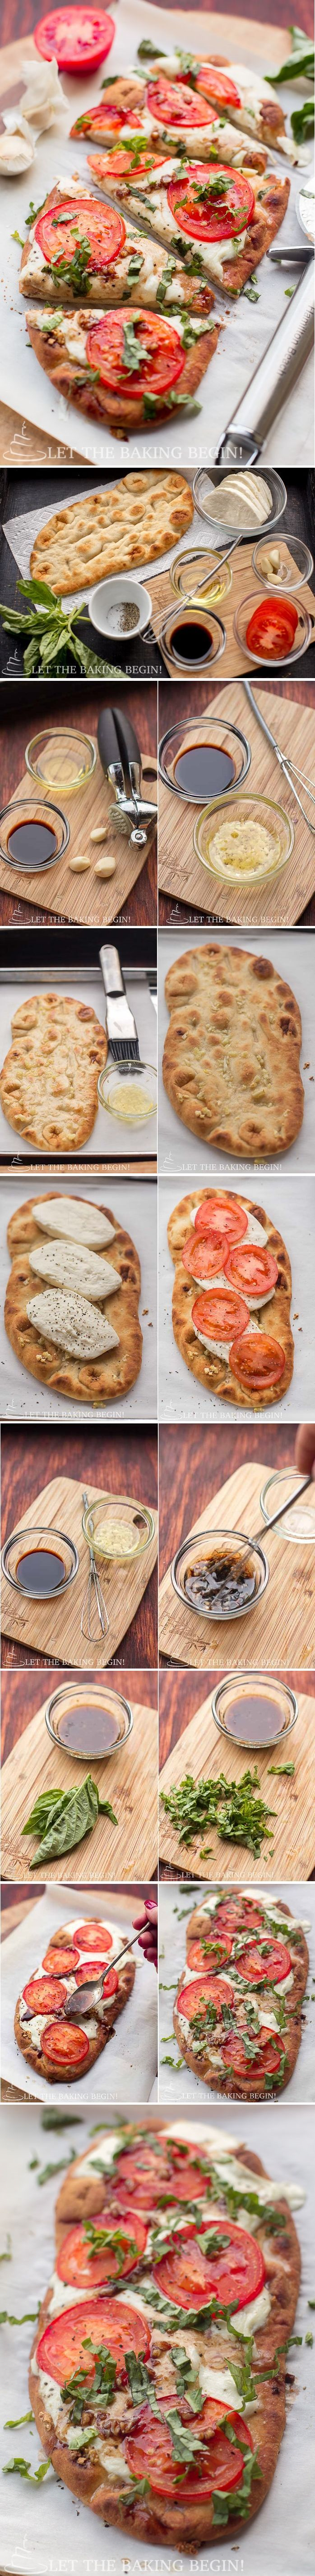 15 Minute Easy Margherita Flatbread Pizza